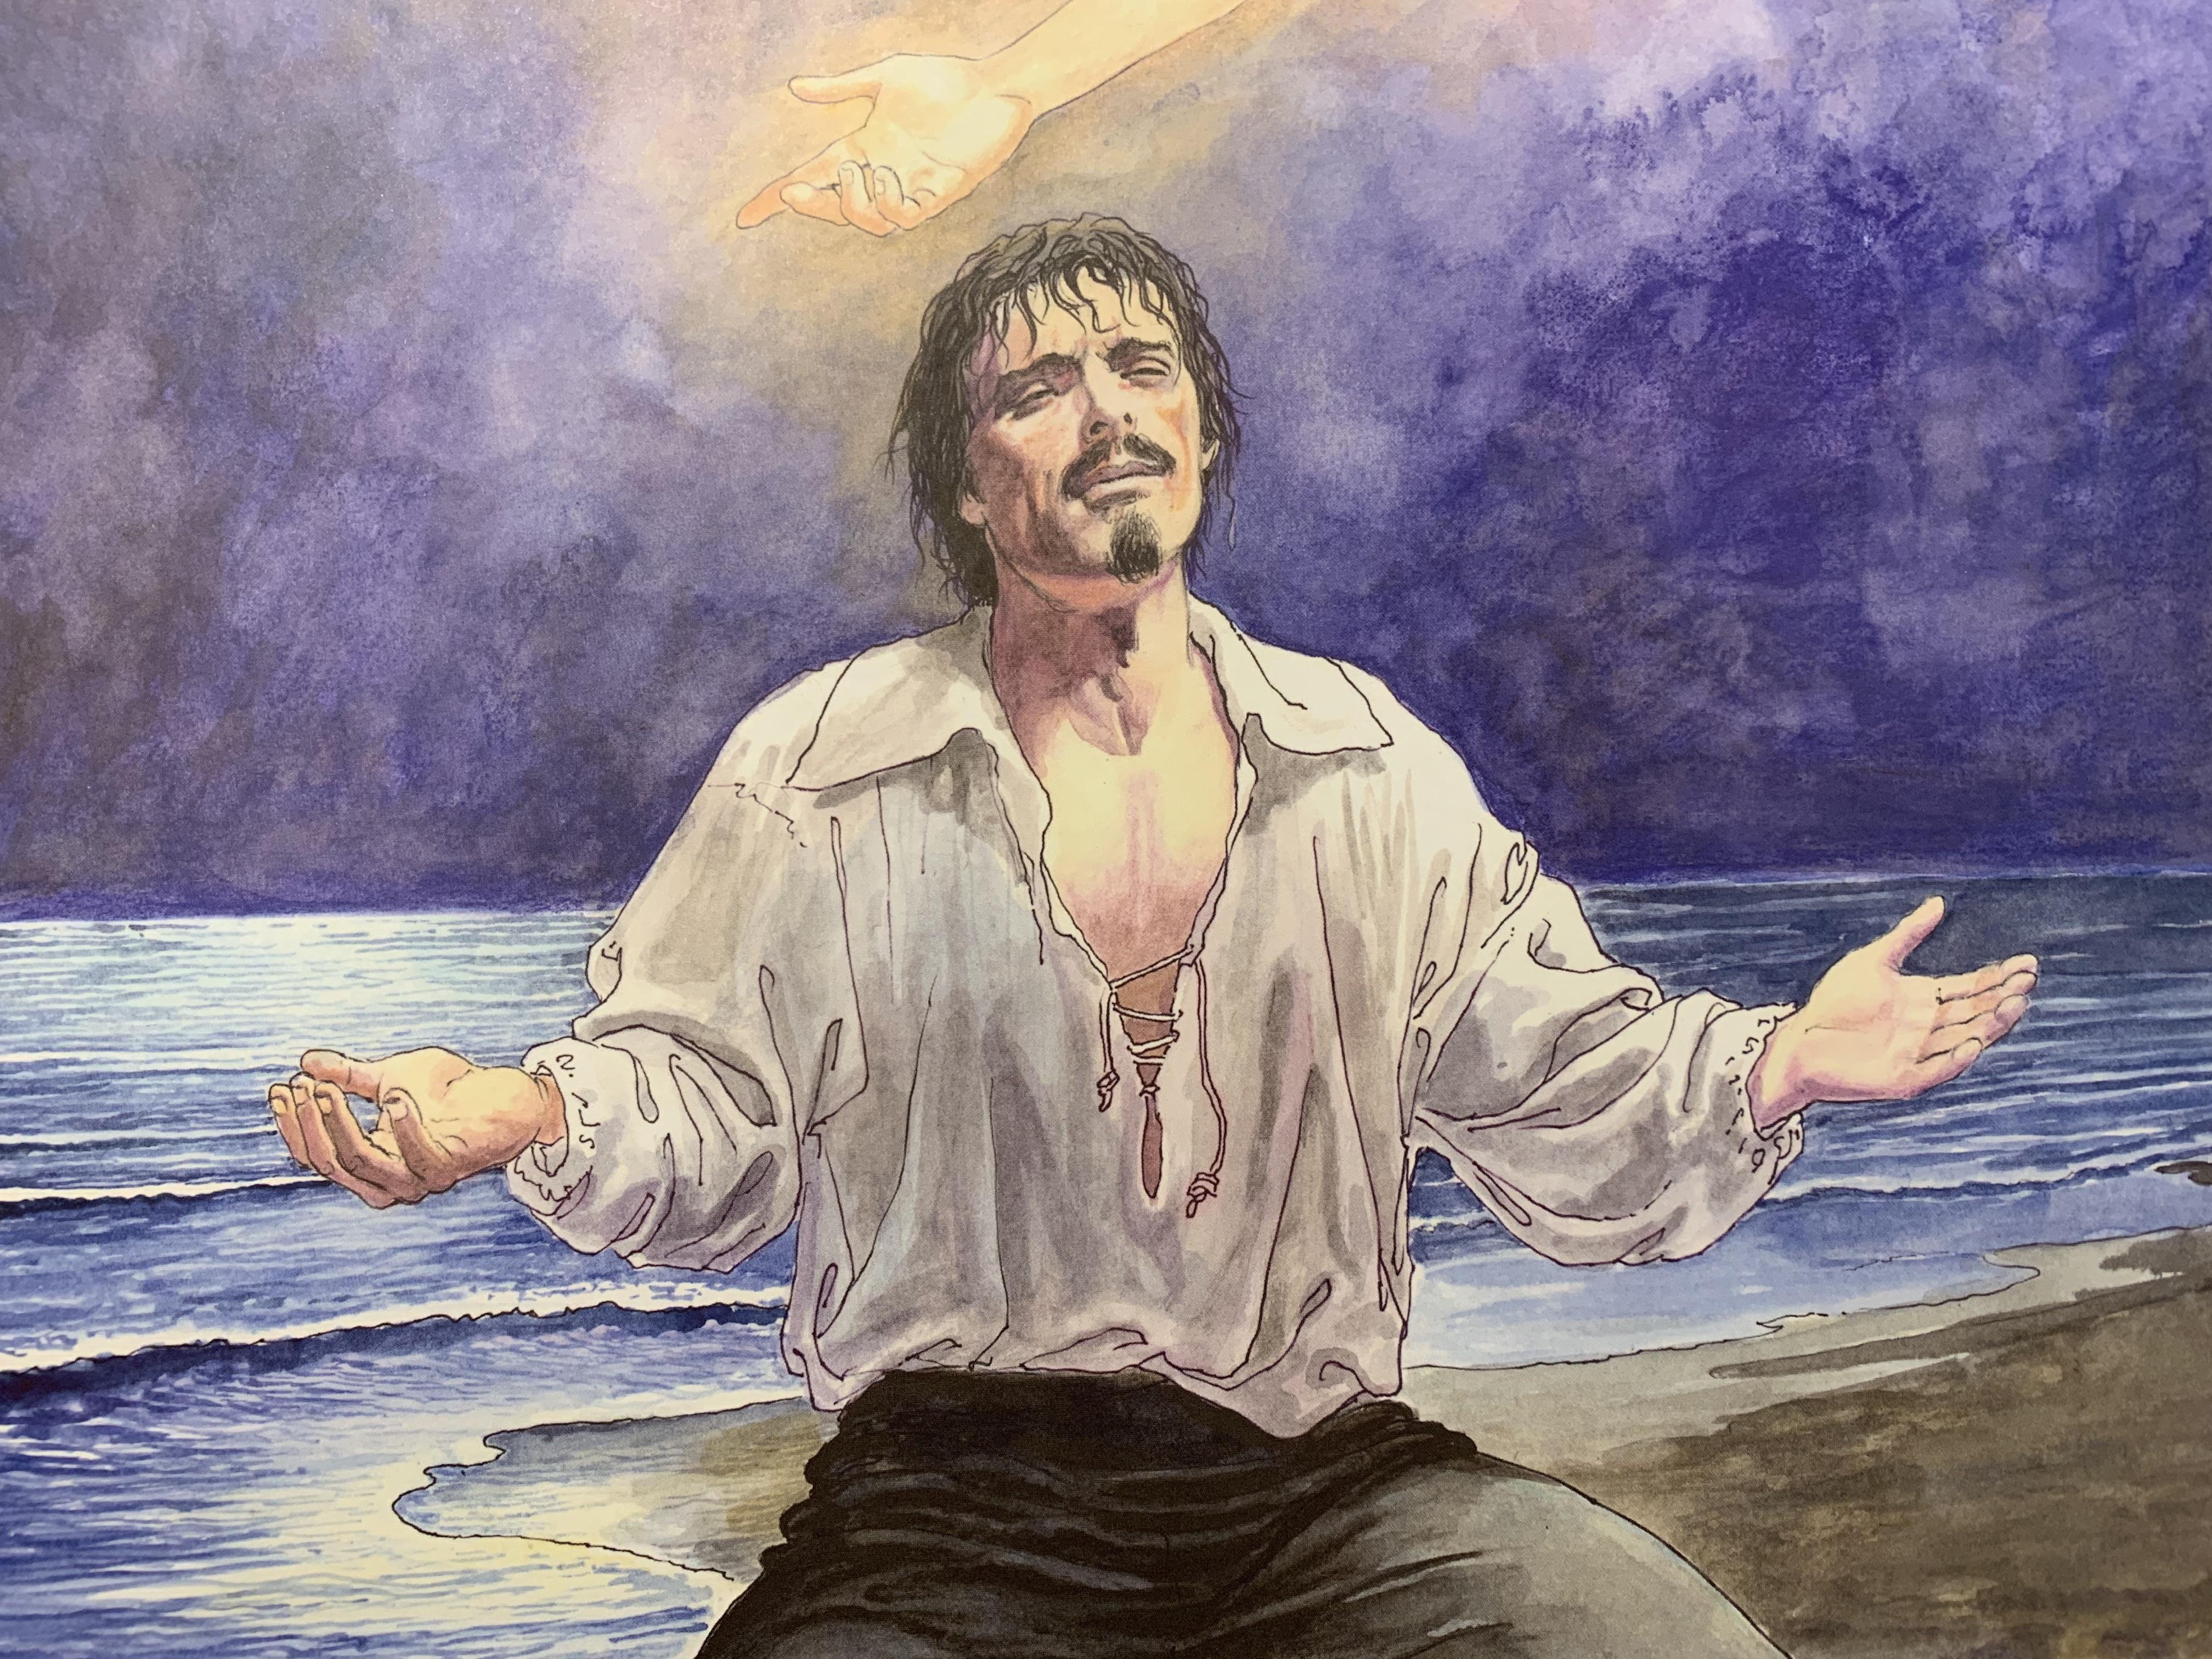 Caravaggio Milo Manara